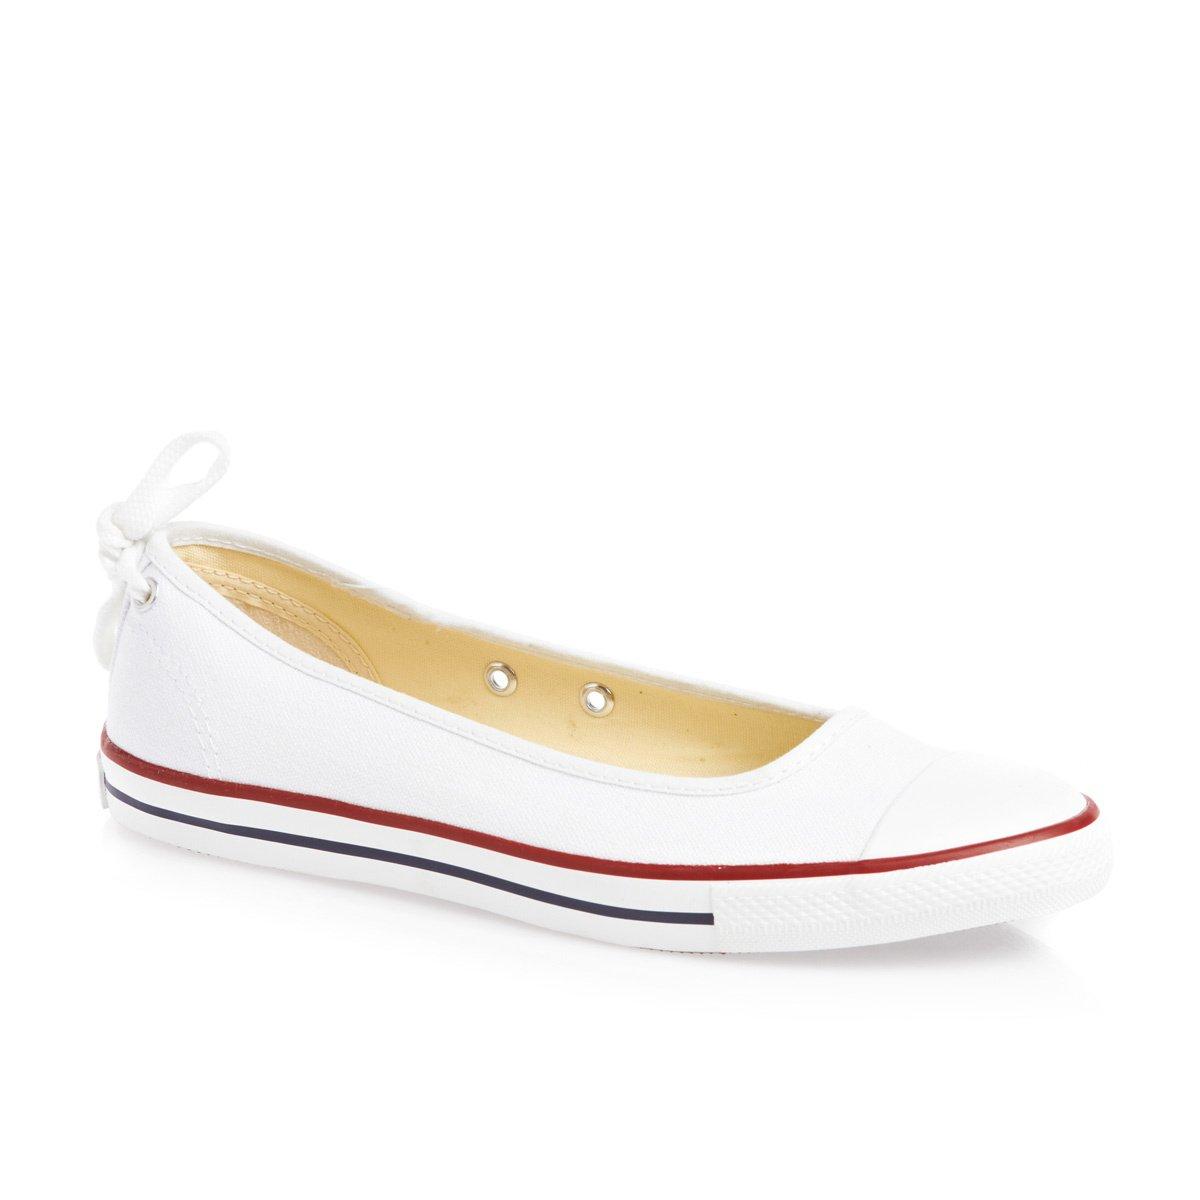 Converse Ballerina converse chuck taylor all star dainty ballerina womens trainers shoes -  white BSSAPAG